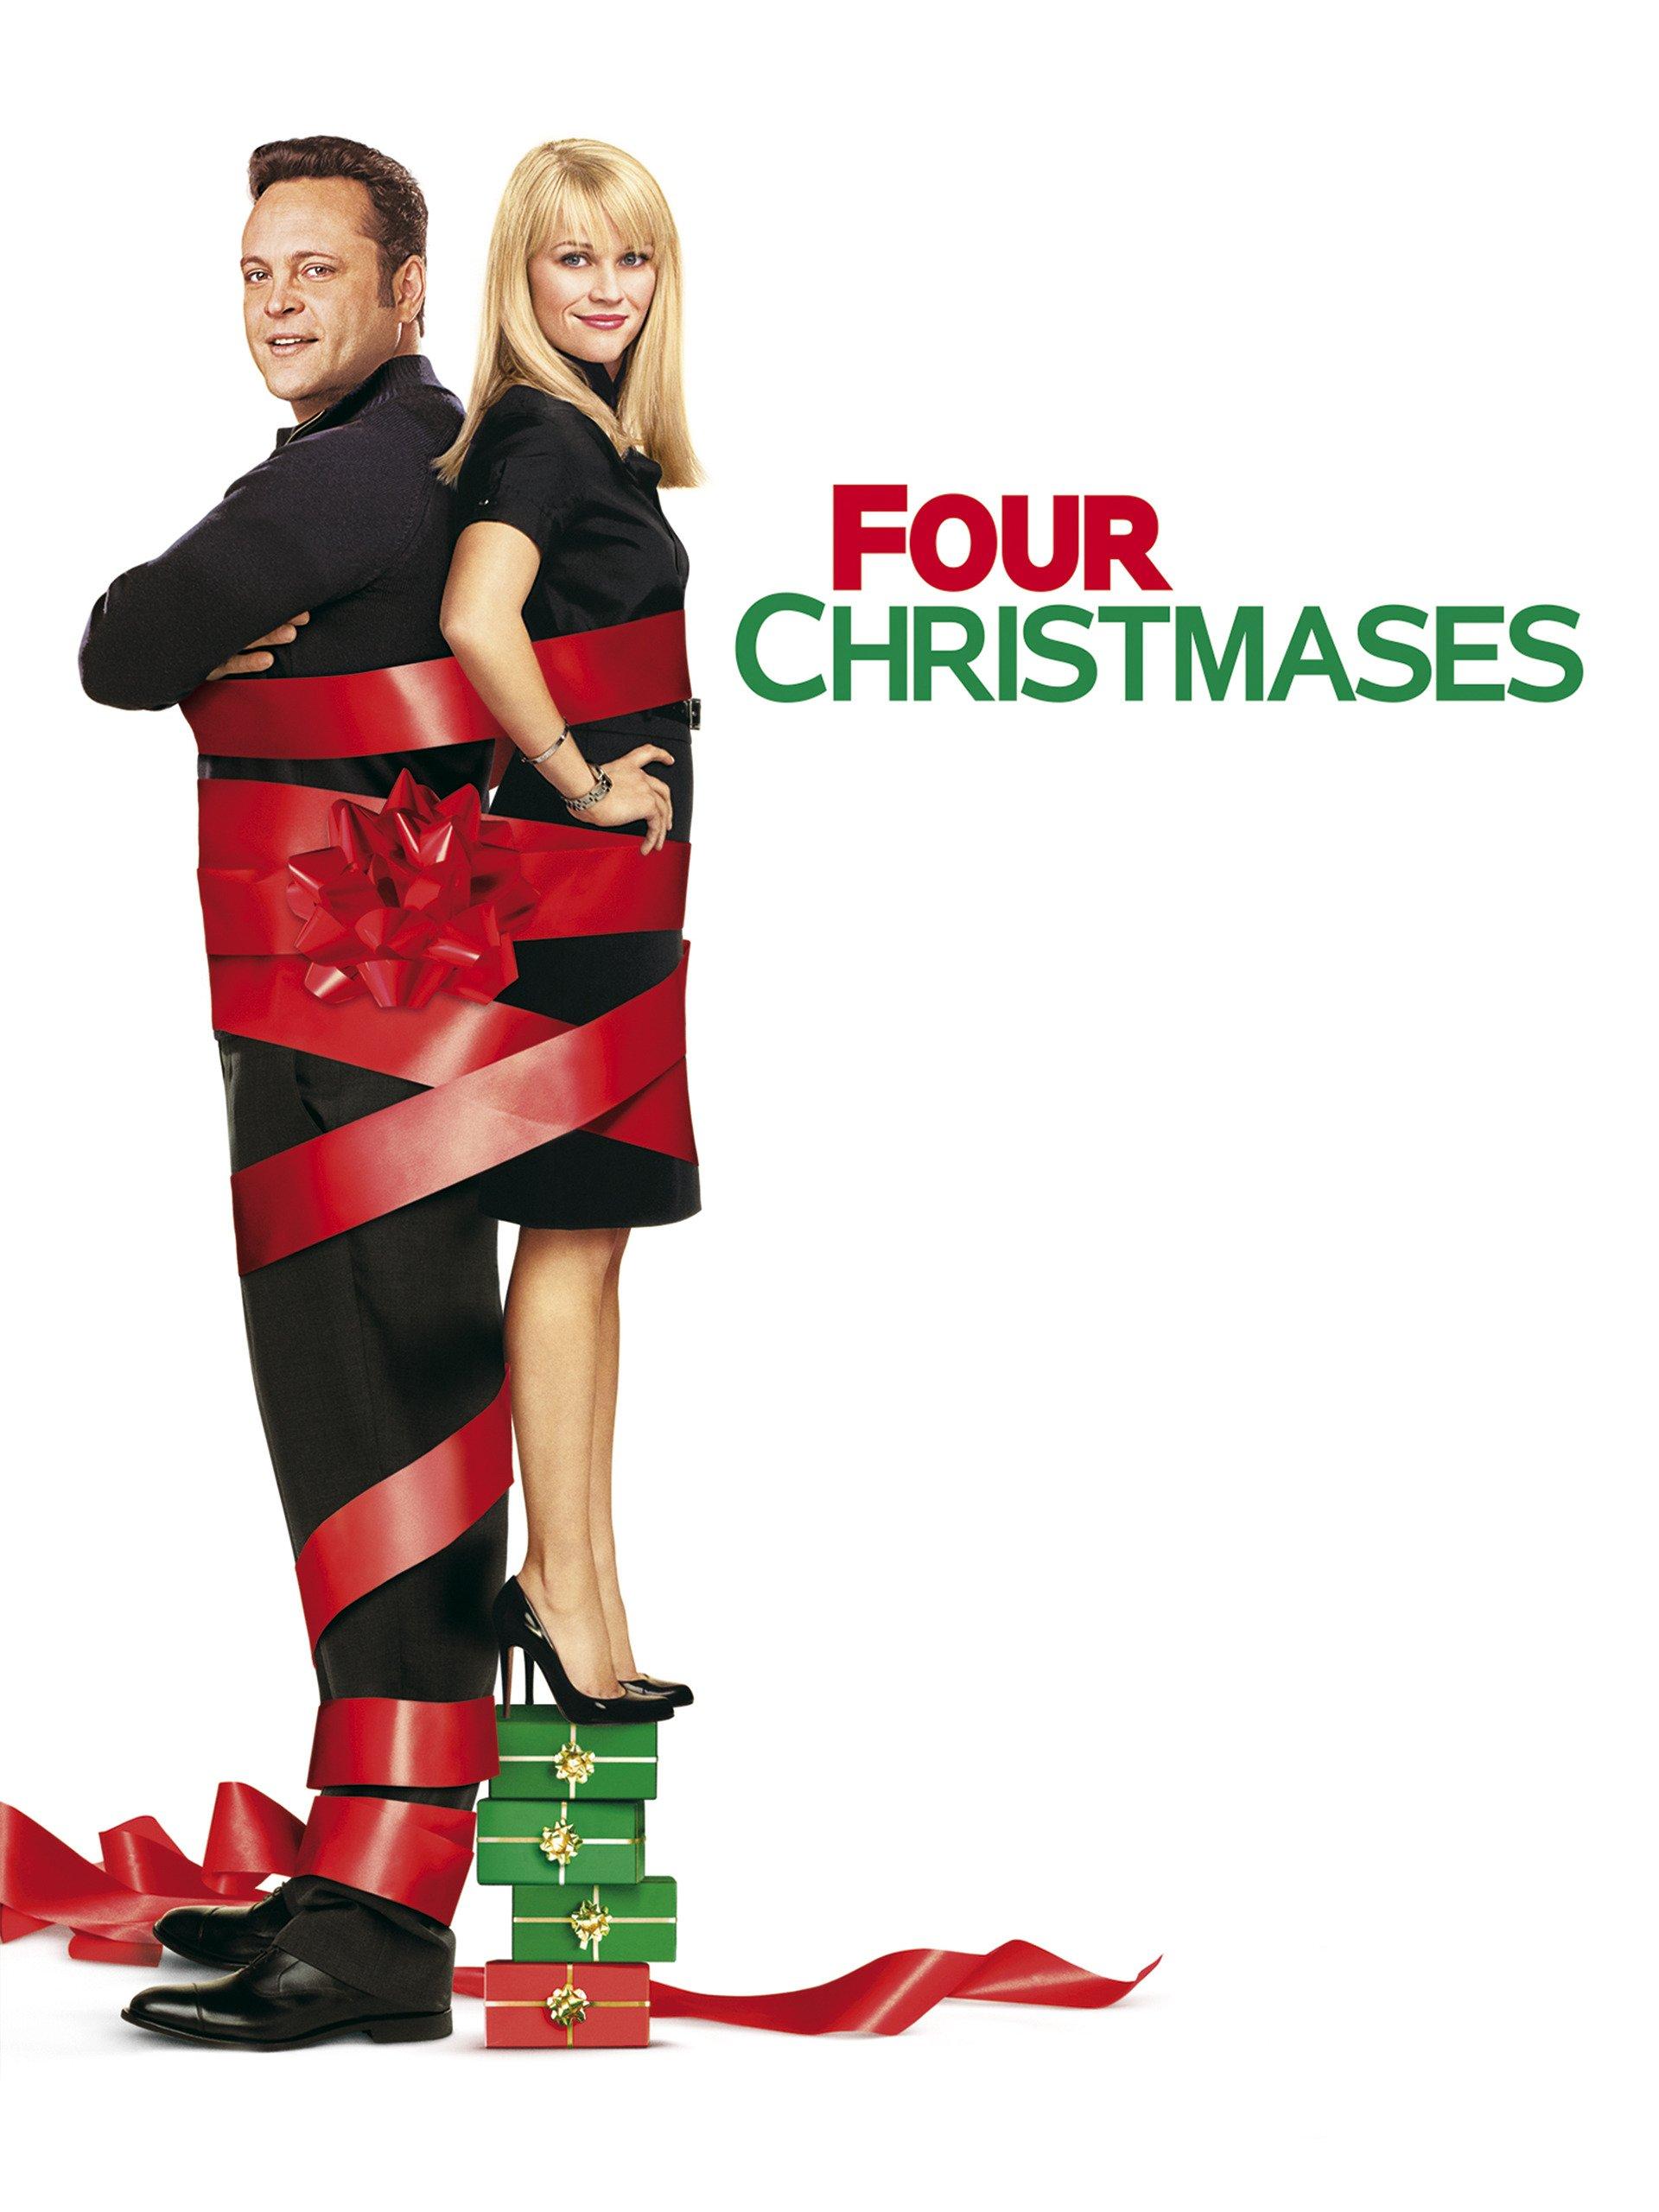 Four Christmases